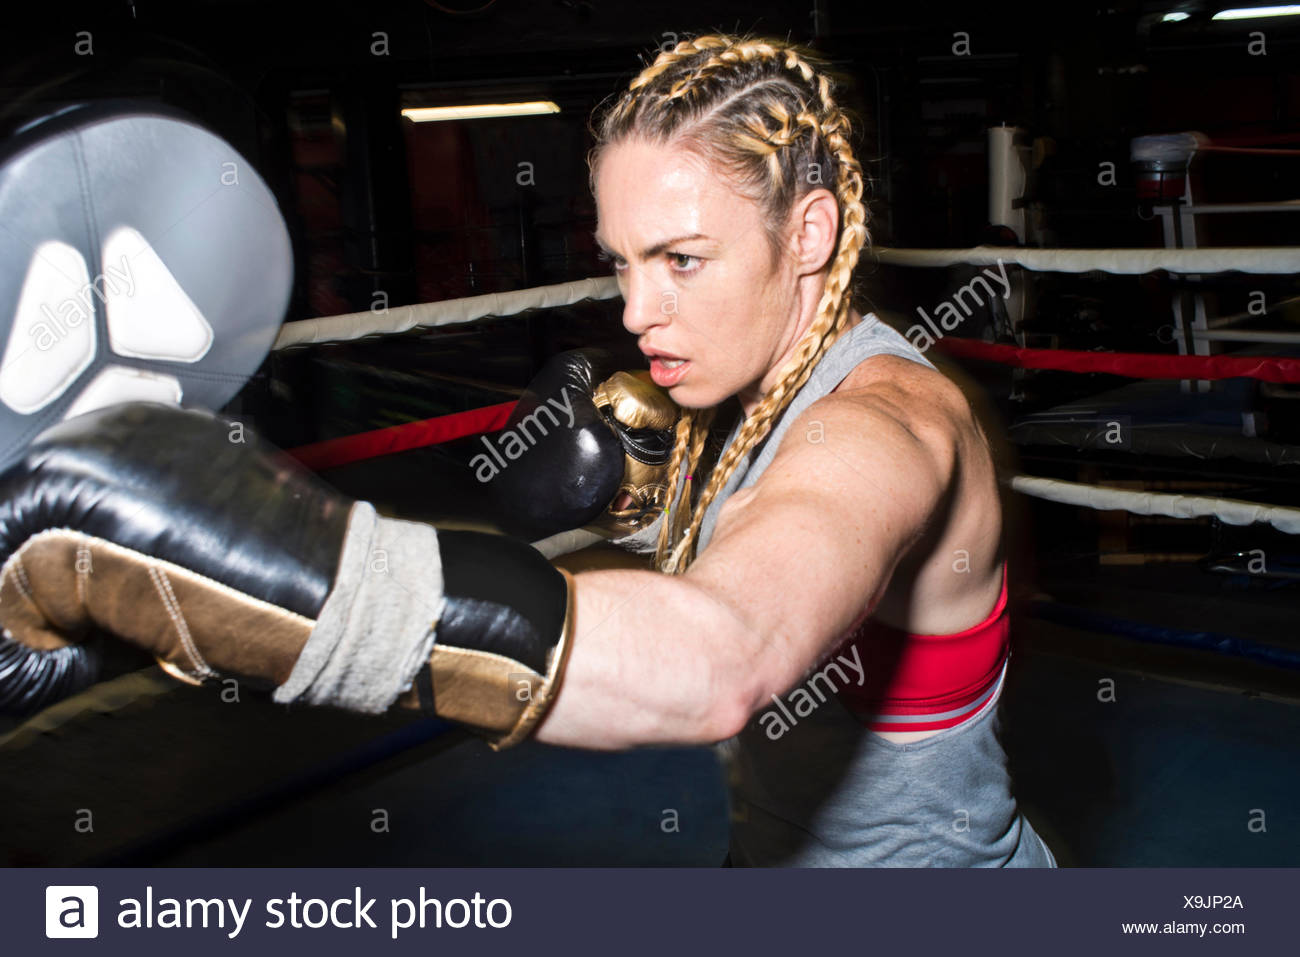 Female boxer punching boxing mitt in boxing ring - Stock Image